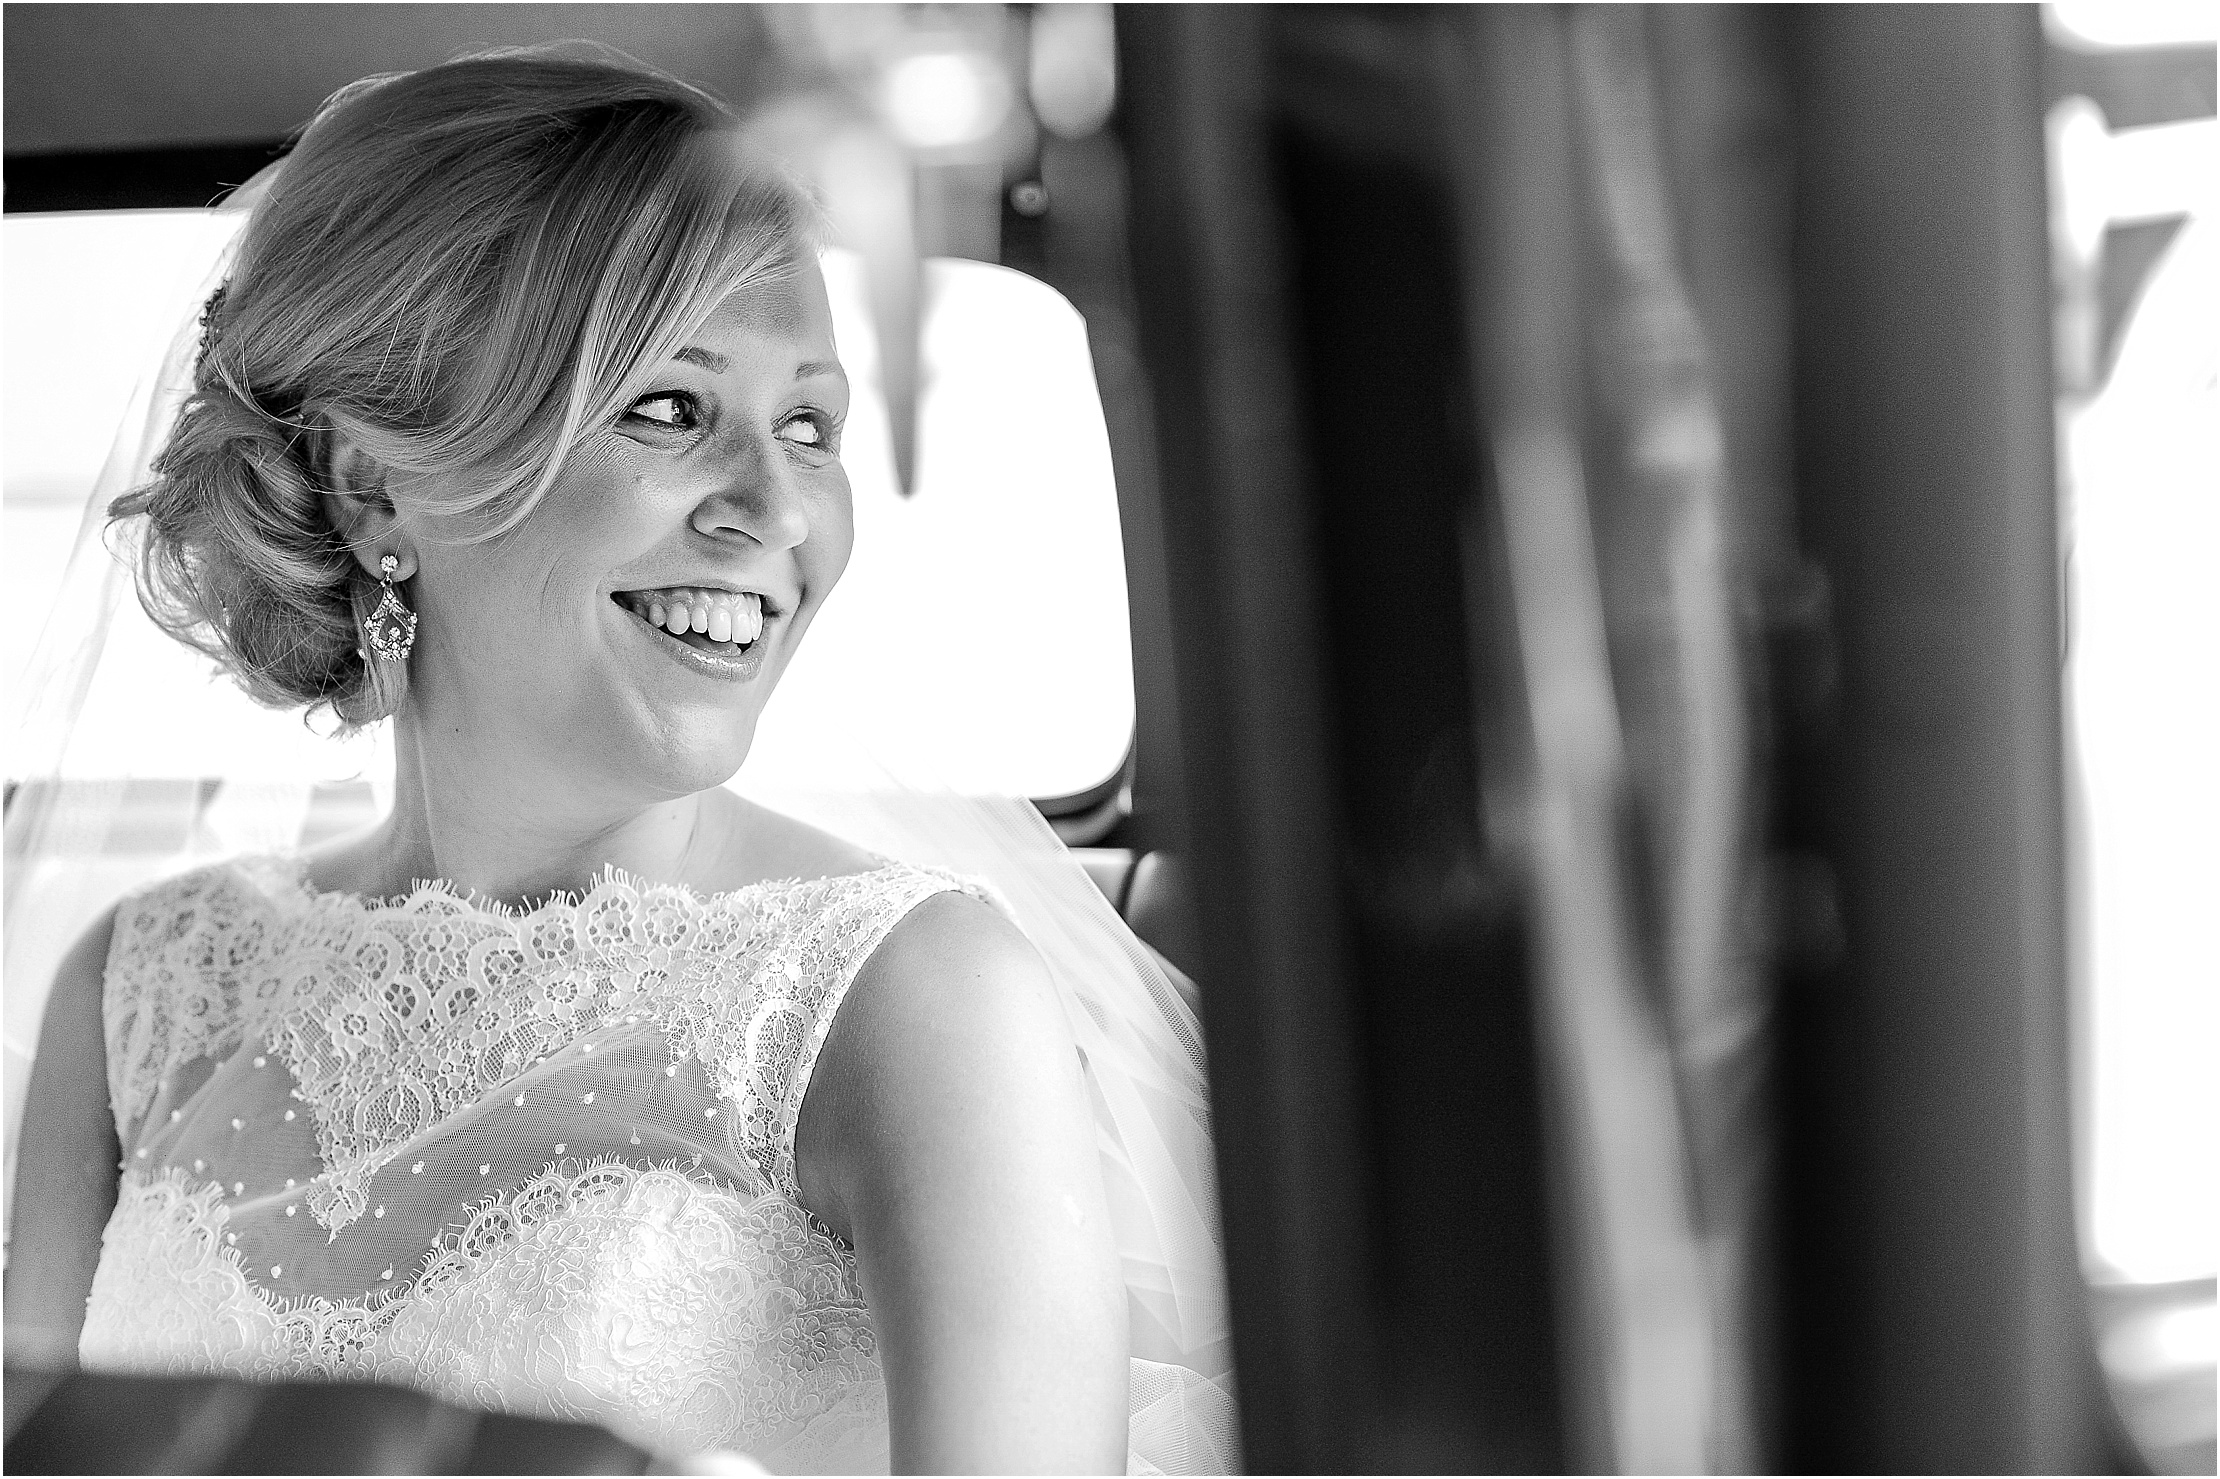 staining-lodge-wedding-044.jpg